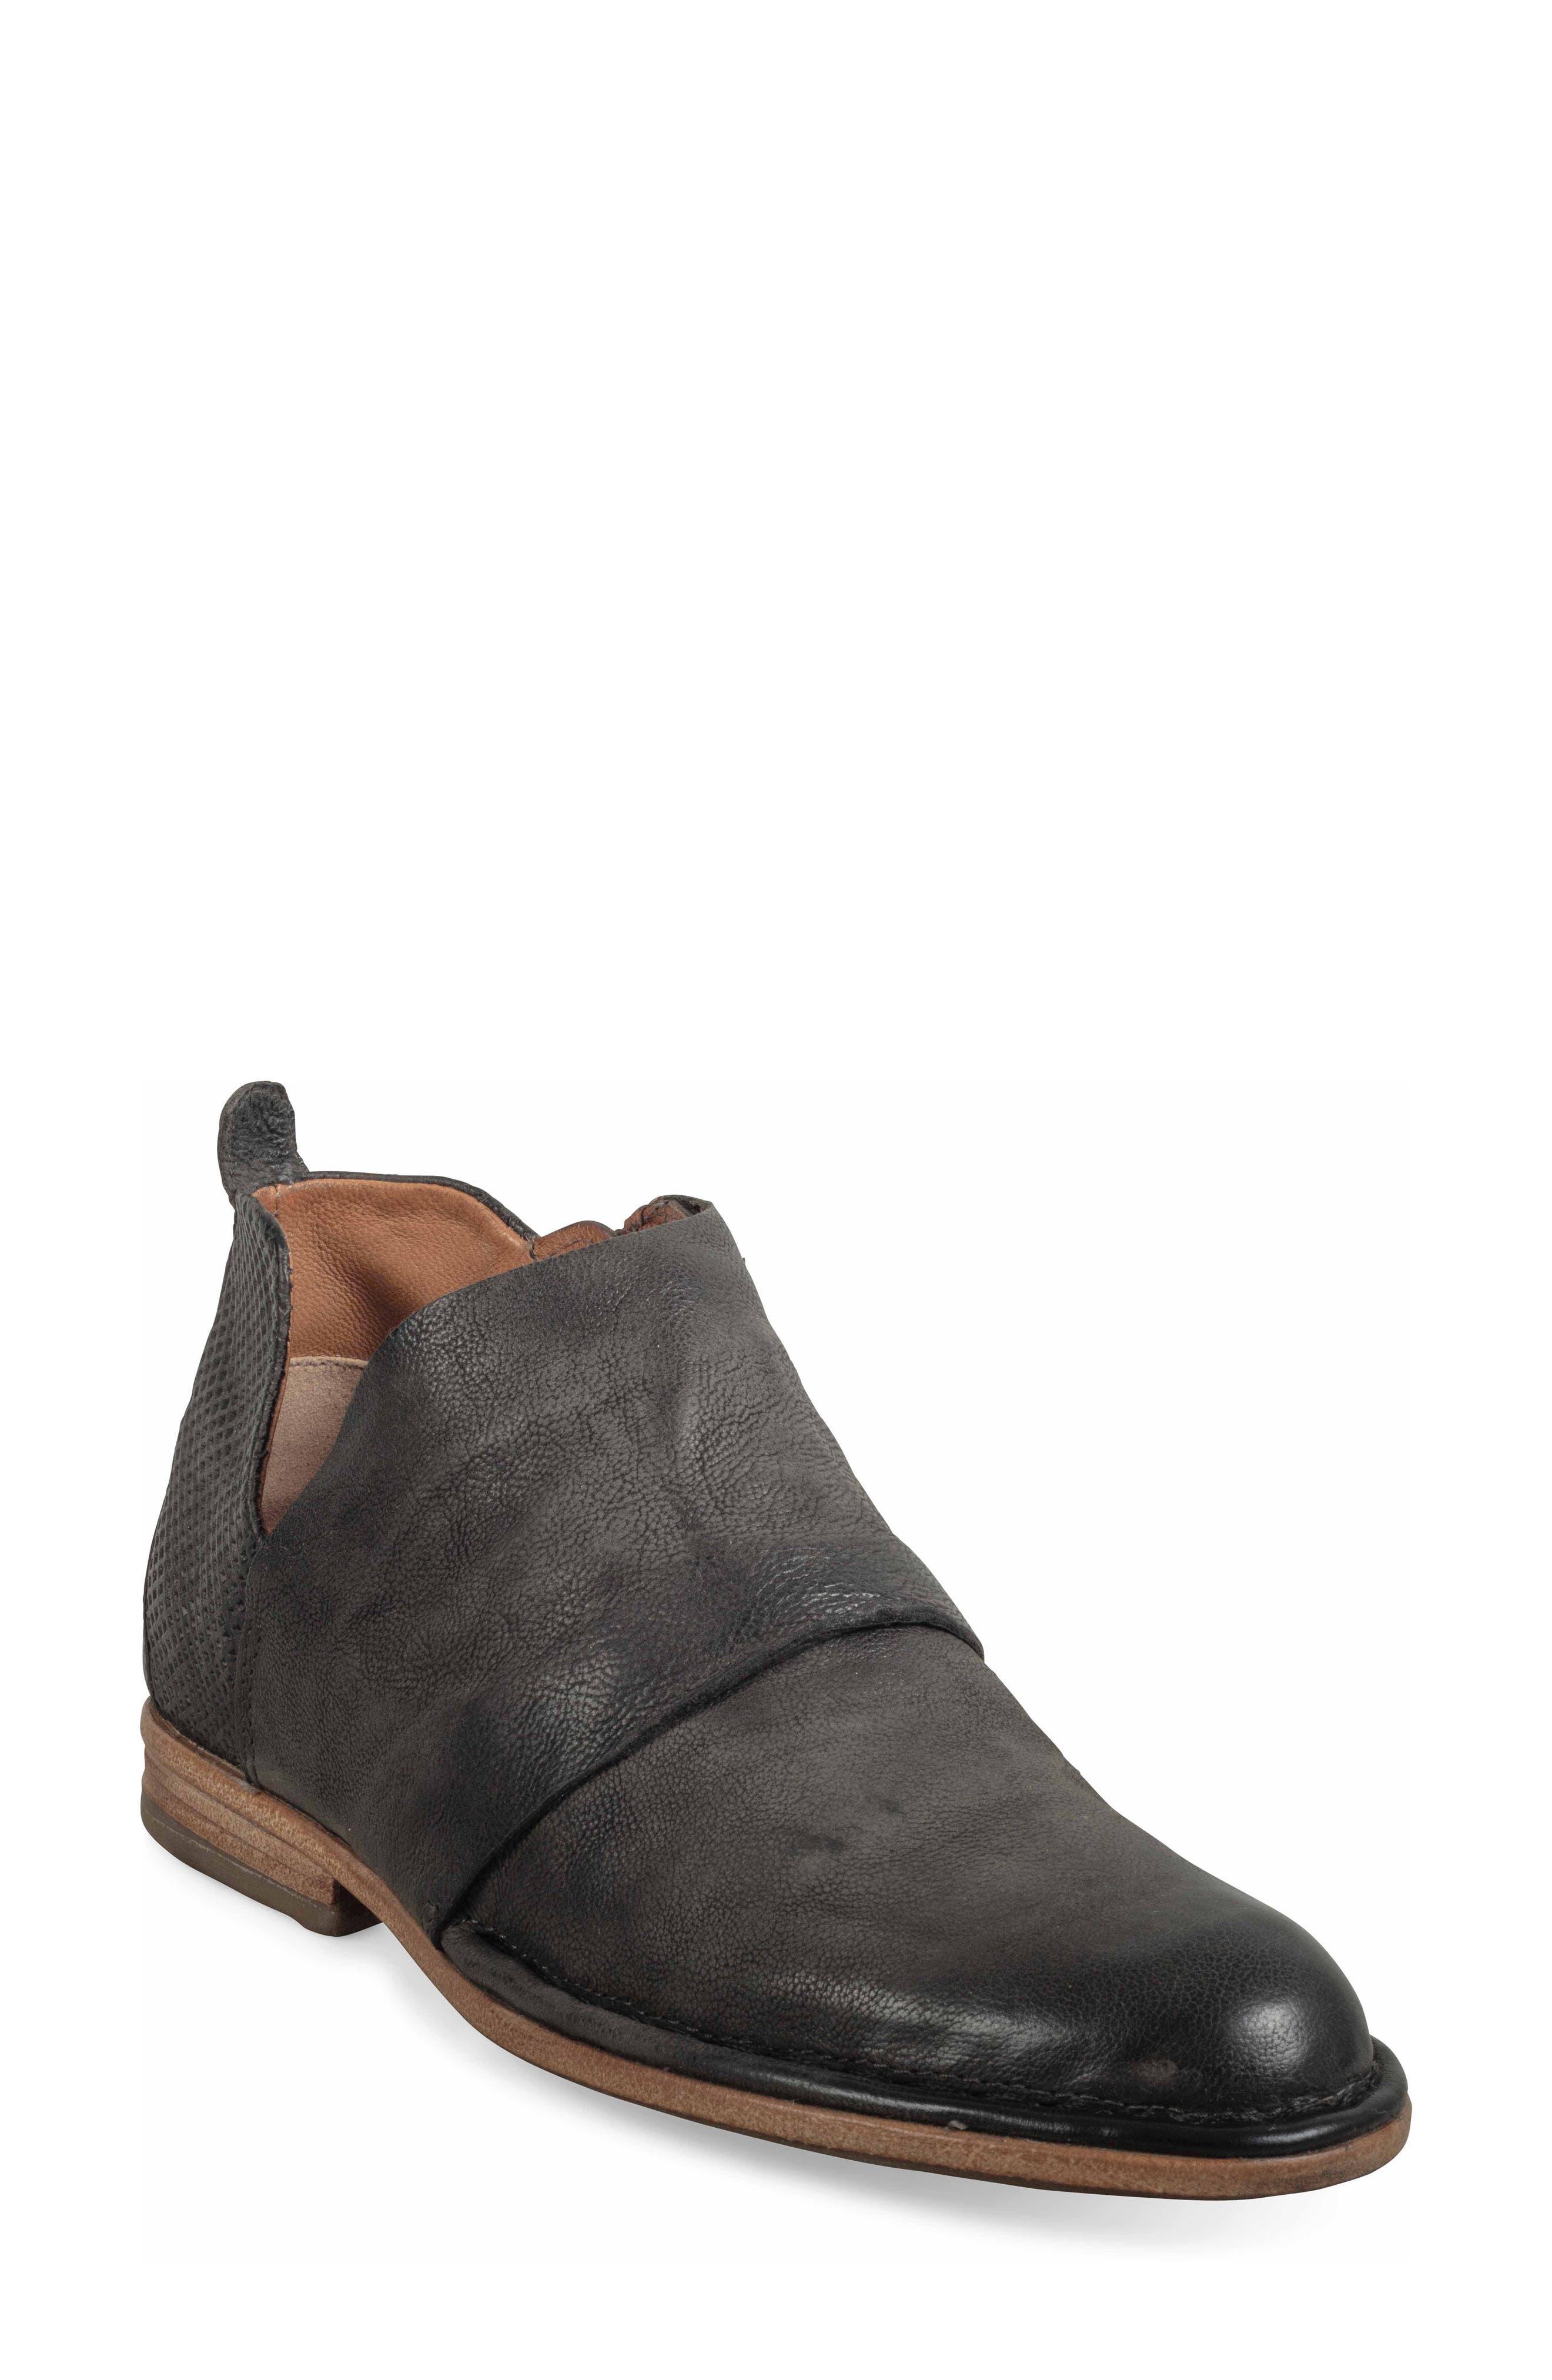 A.s.98 Biel Ankle Boot - Grey